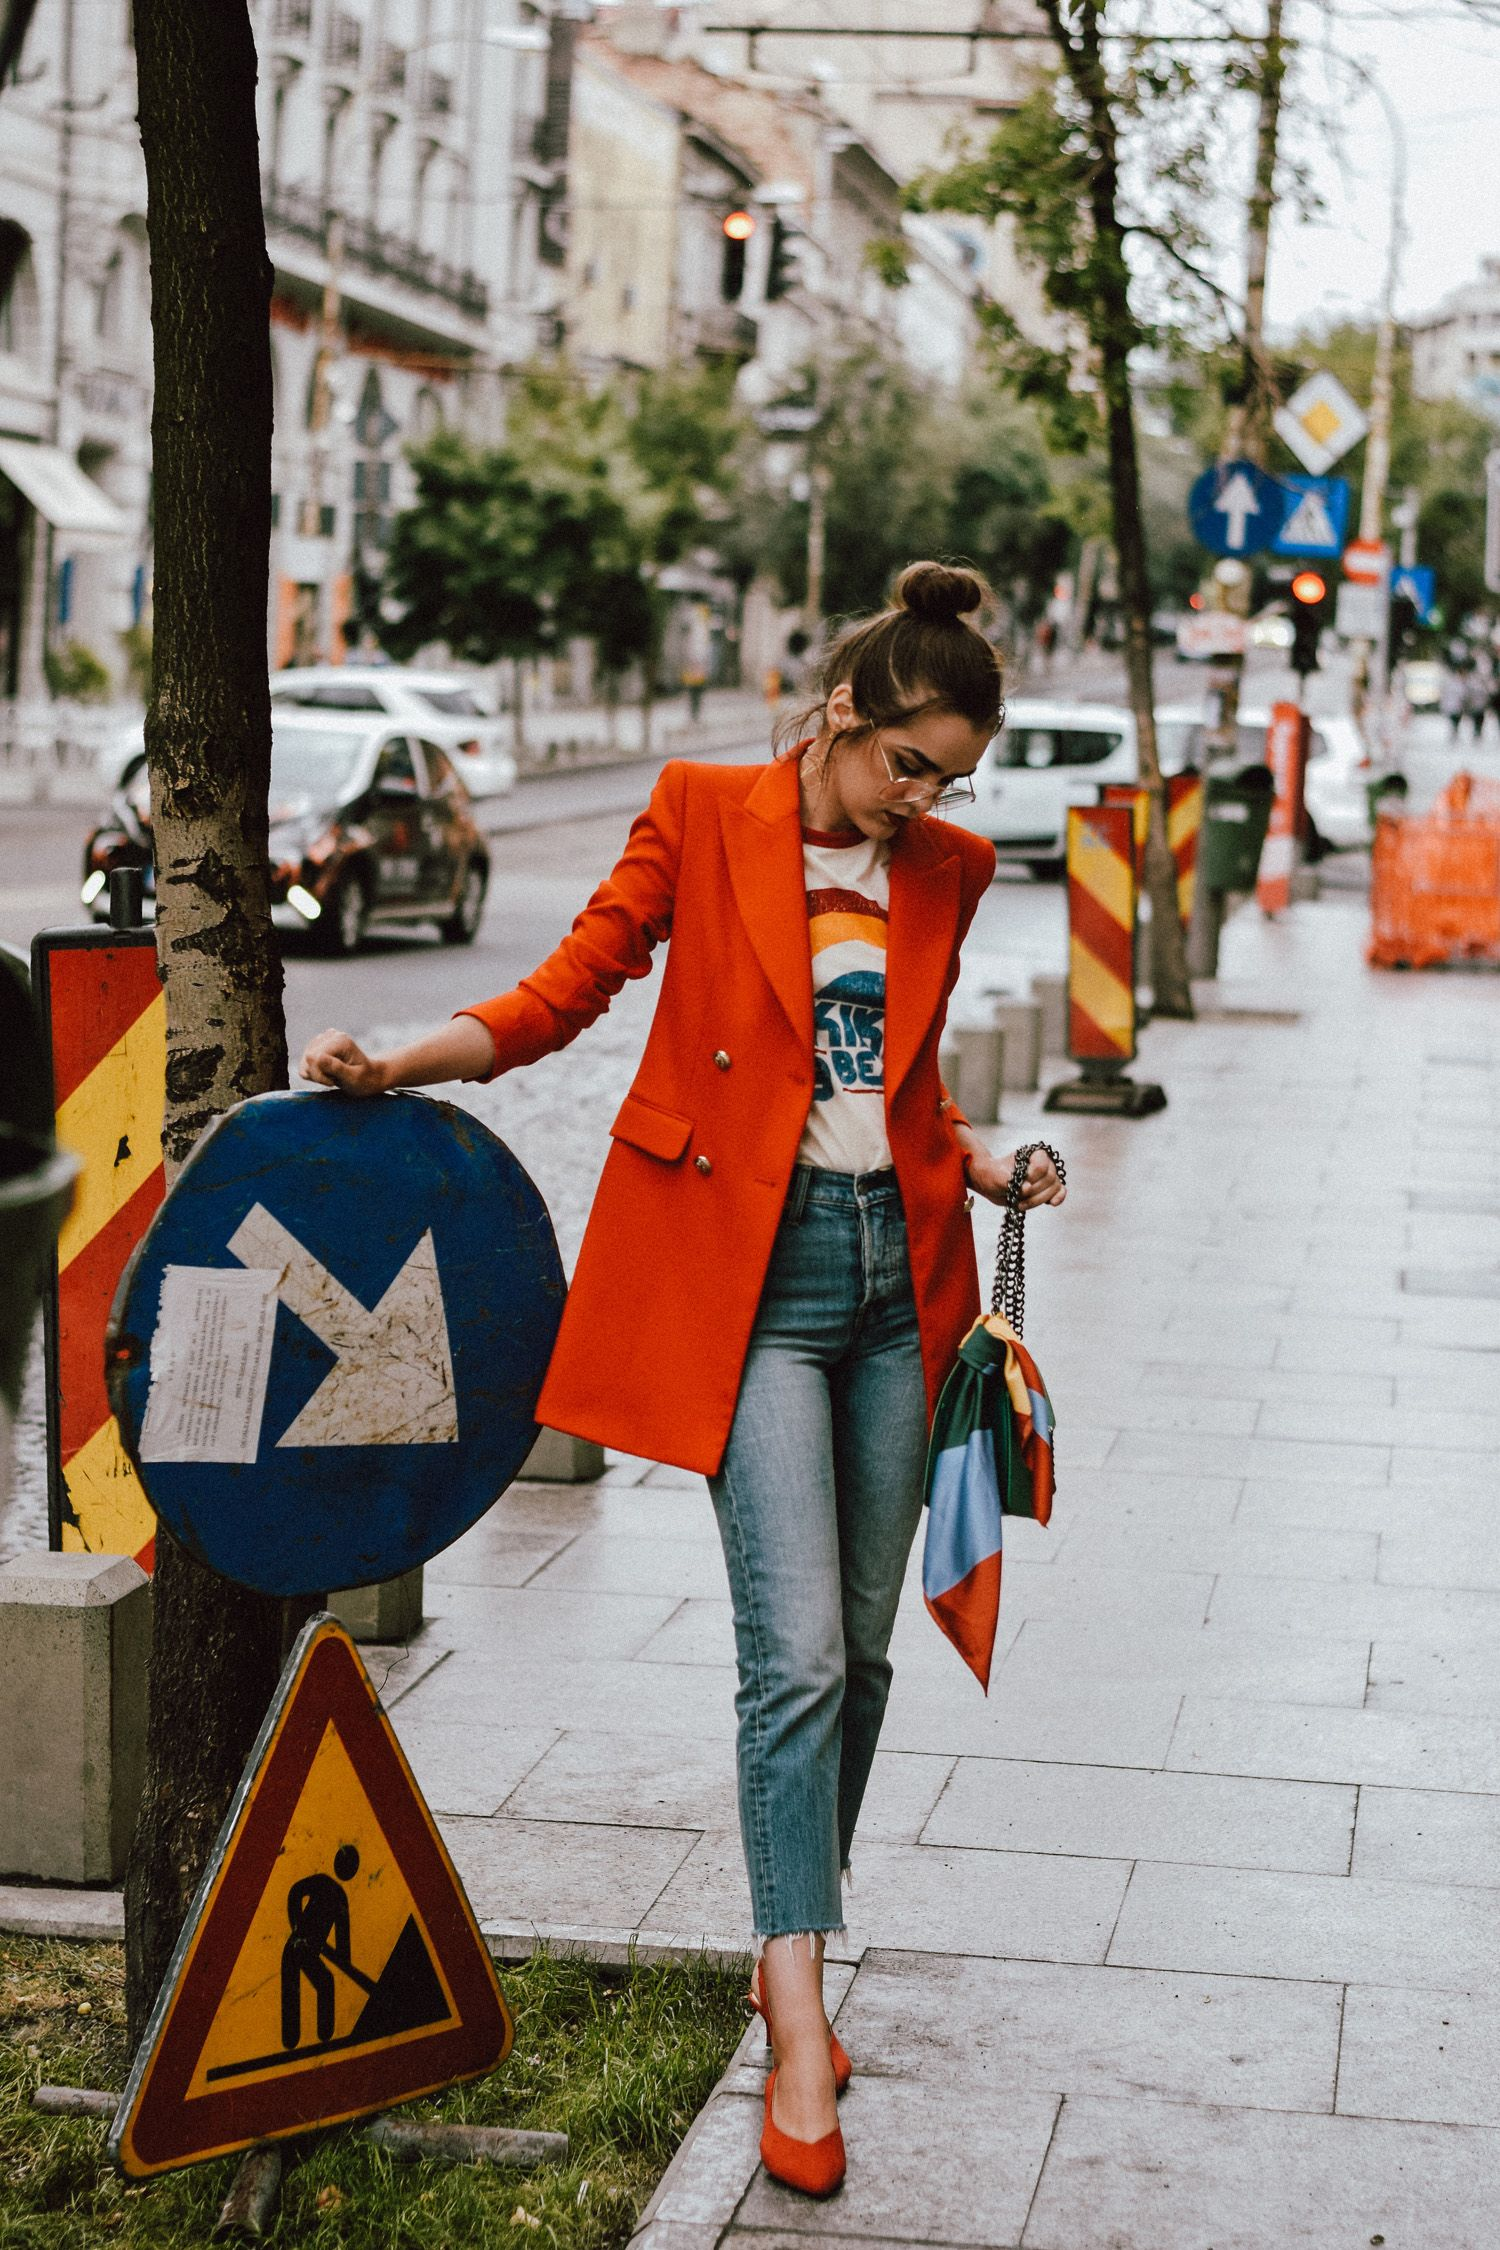 51a8fa06f819 Zara orange blazer, asos double breasted blazer, bold color jacket, gold  earrings, mango retro graphic tee, printed colorblock t-shirt, levi's light  was 501 ...